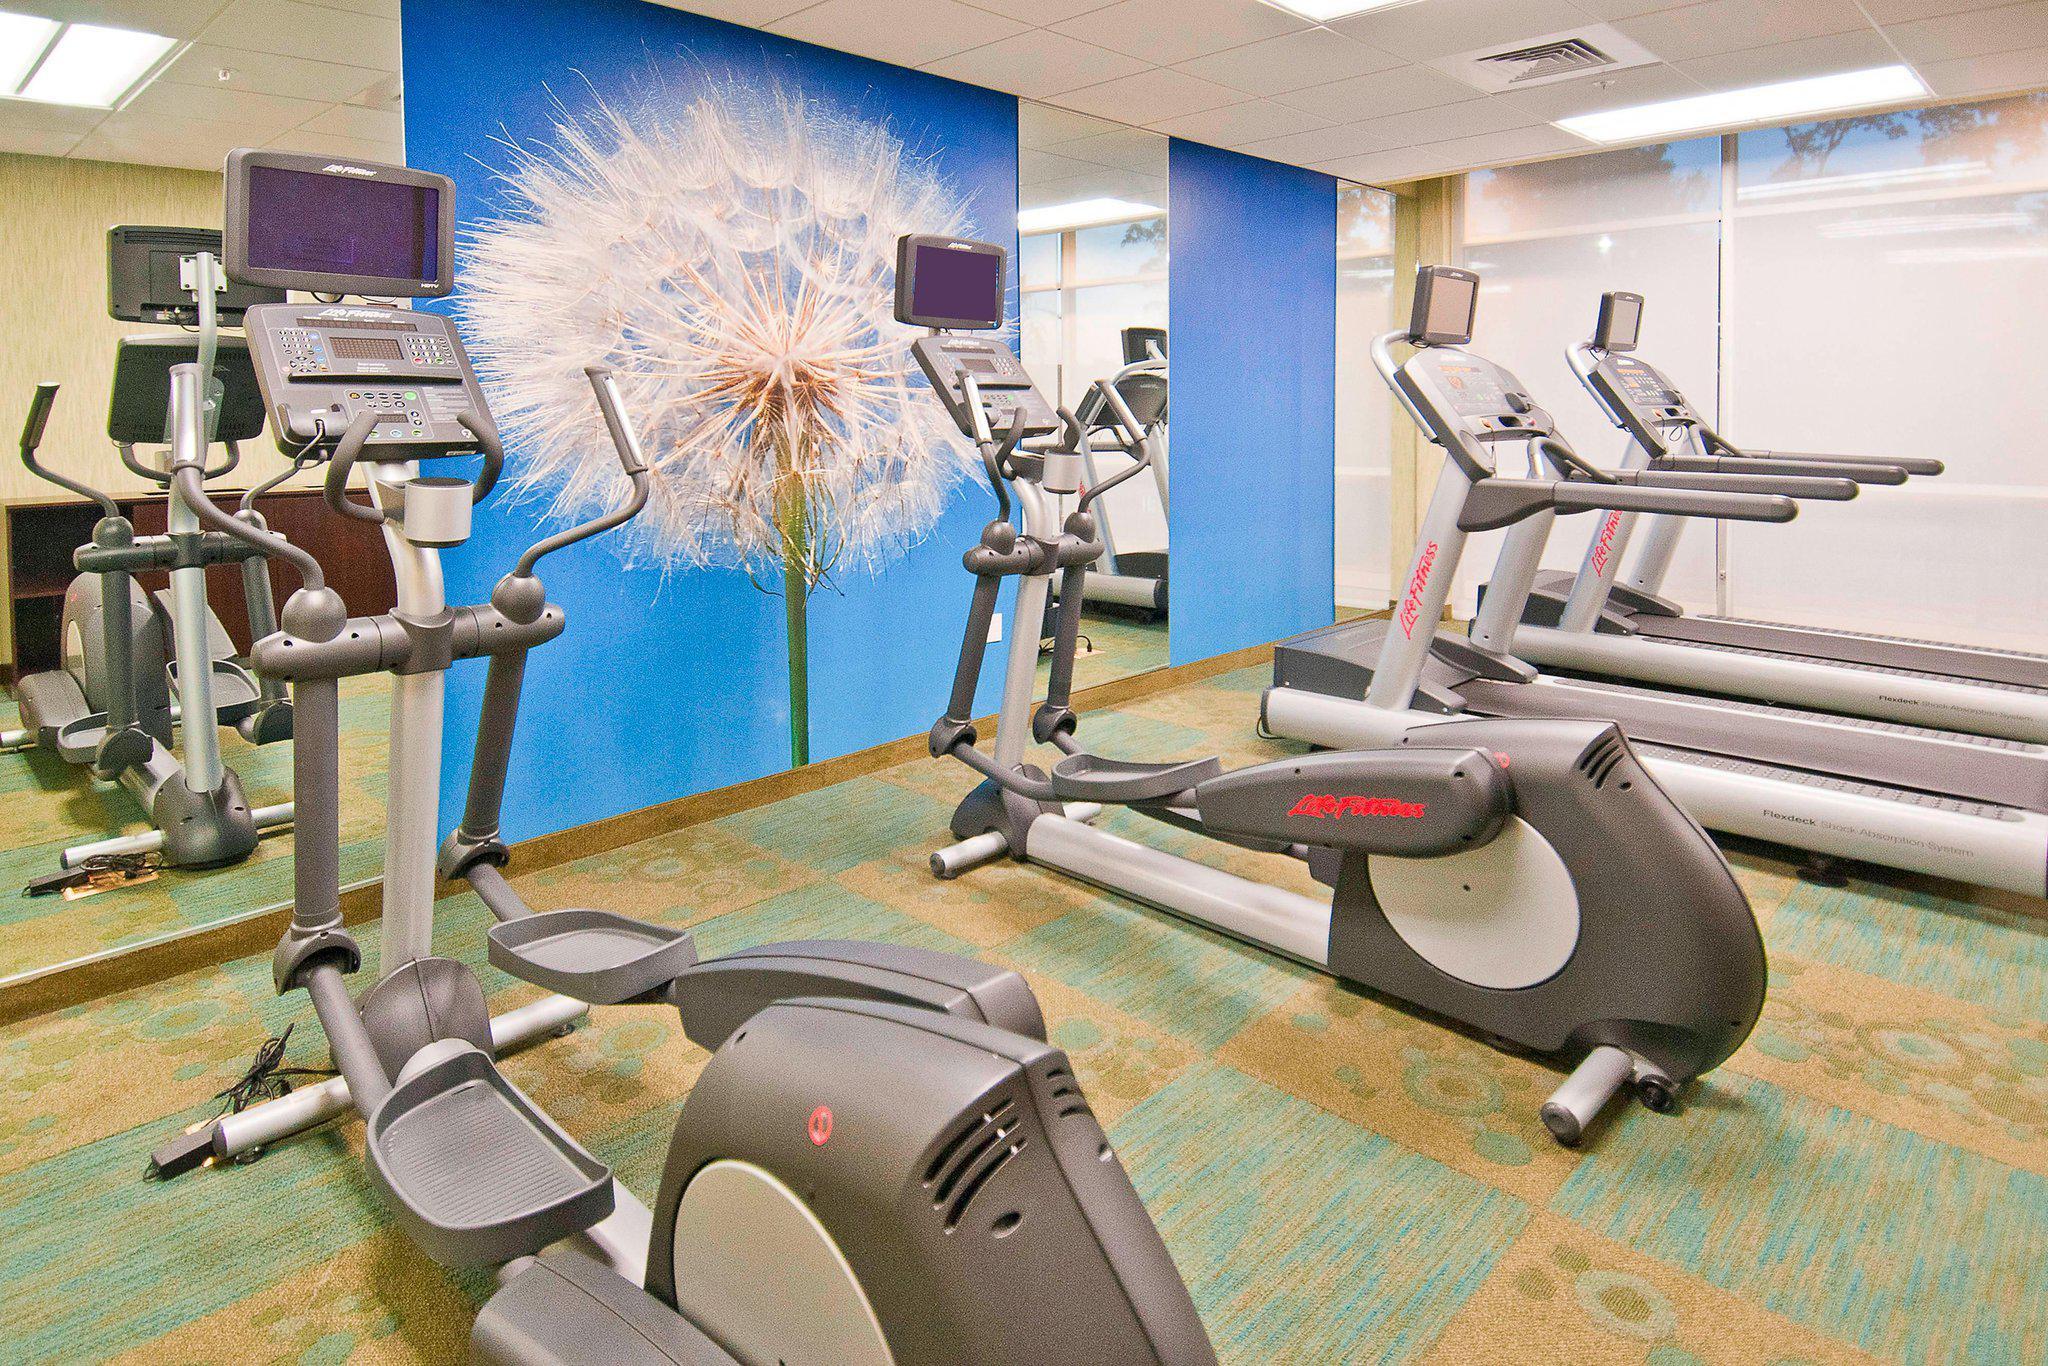 SpringHill Suites by Marriott Baton Rouge Gonzales